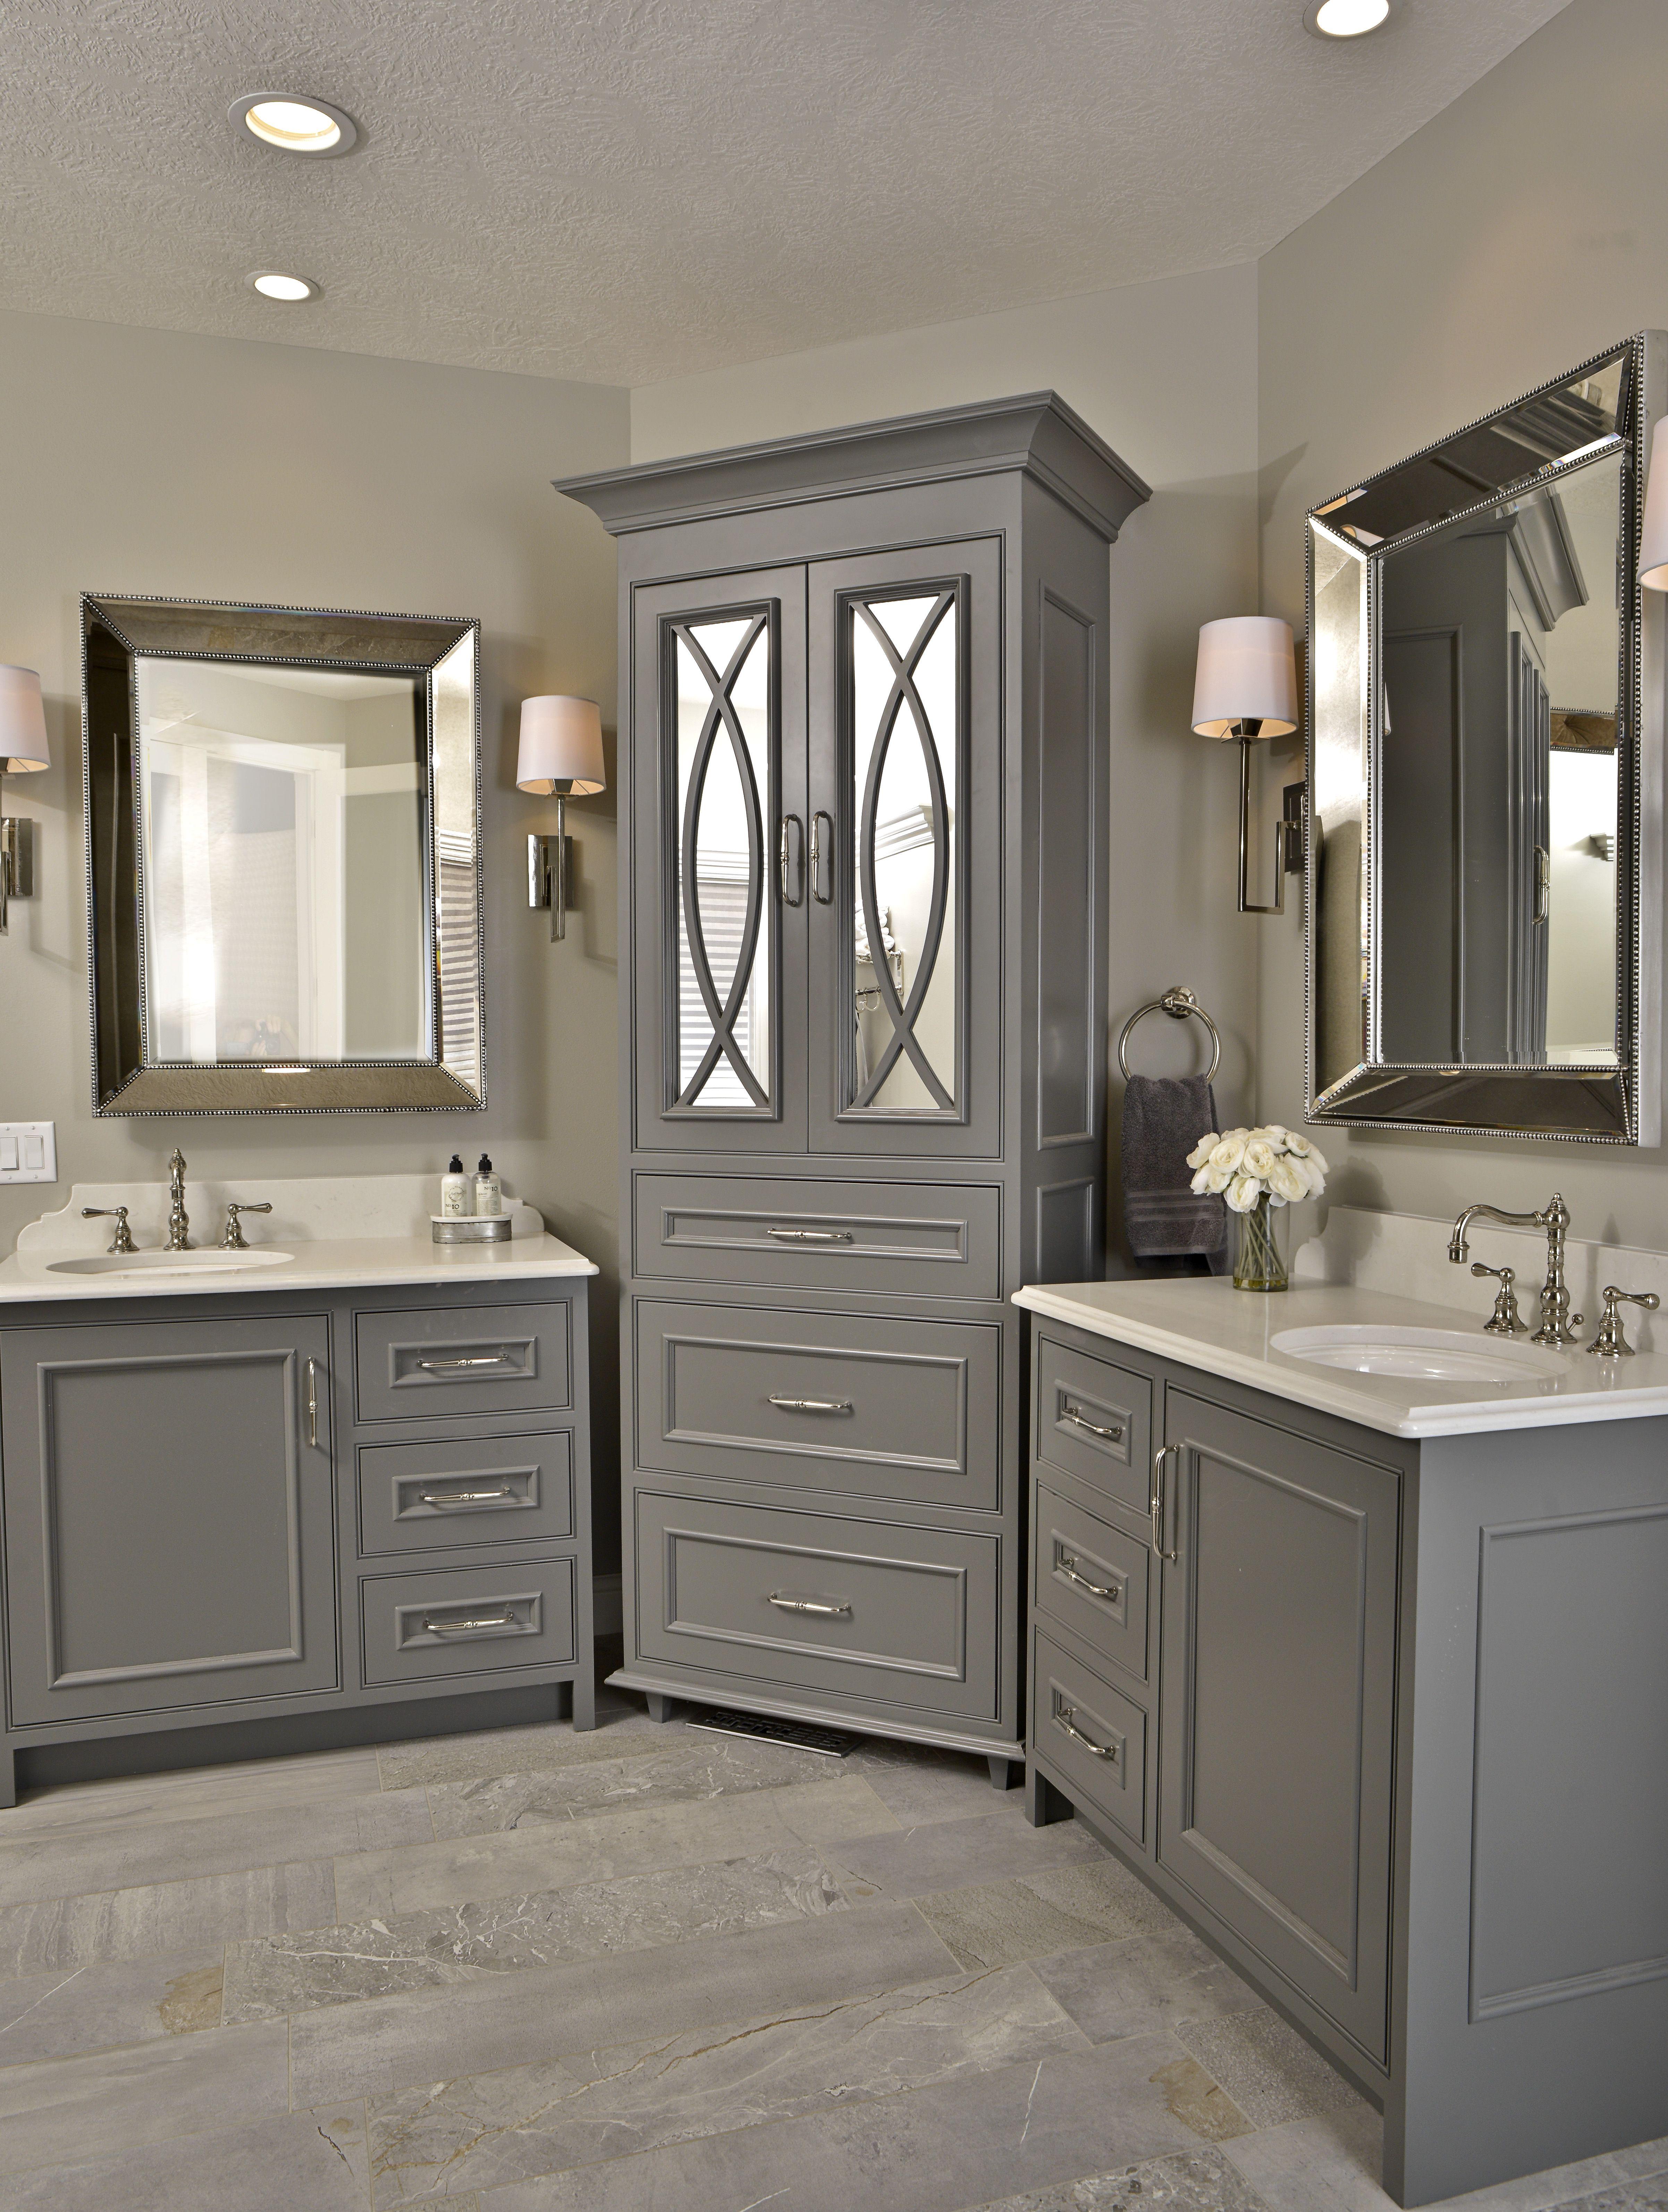 Beautiful Bathroom Gauntlet Gray Cabinets Master Bath two